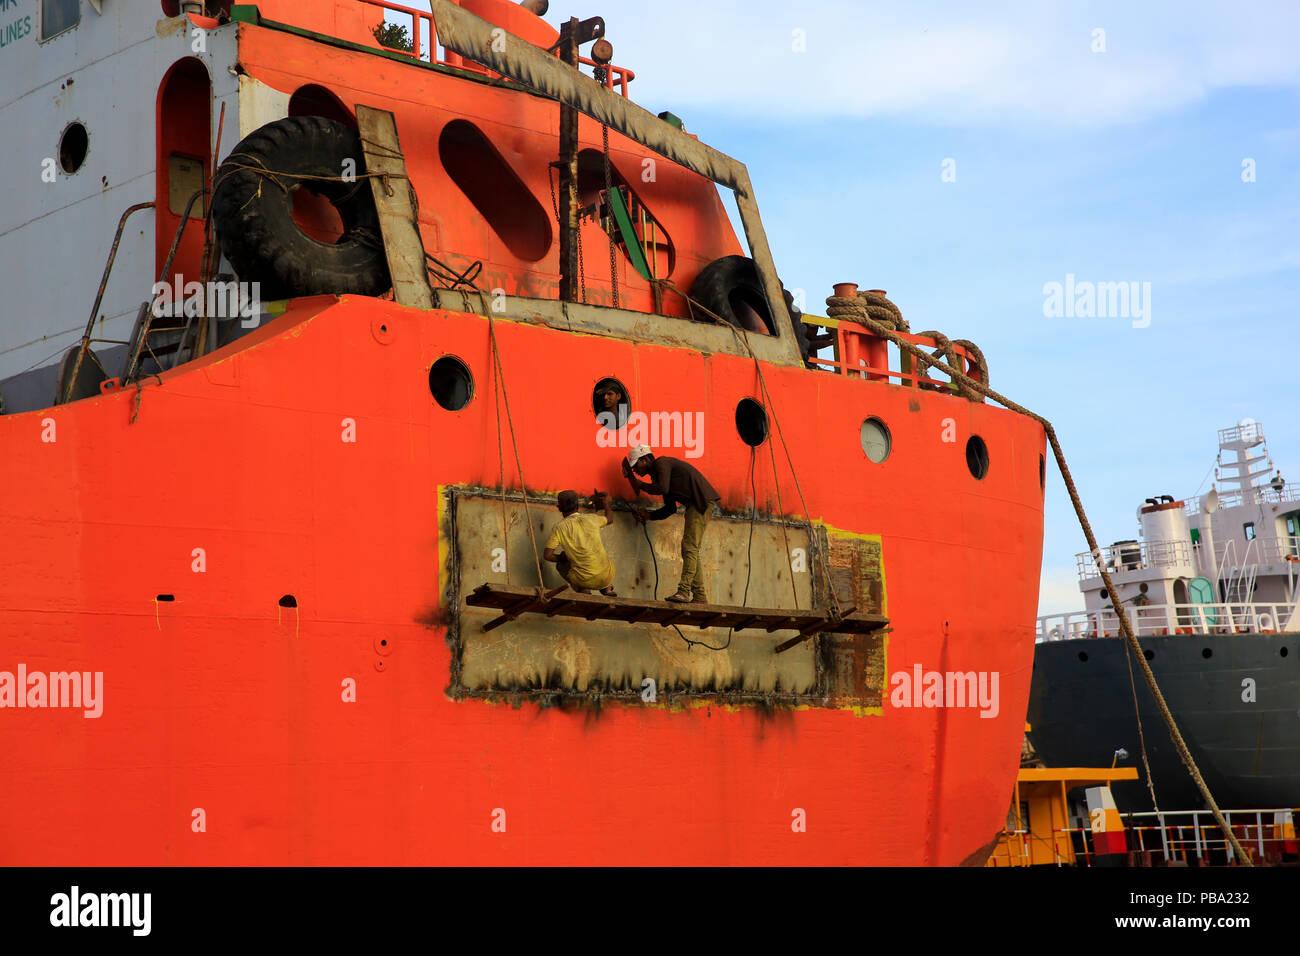 Ship Servicing Photos & Ship Servicing Images - Alamy